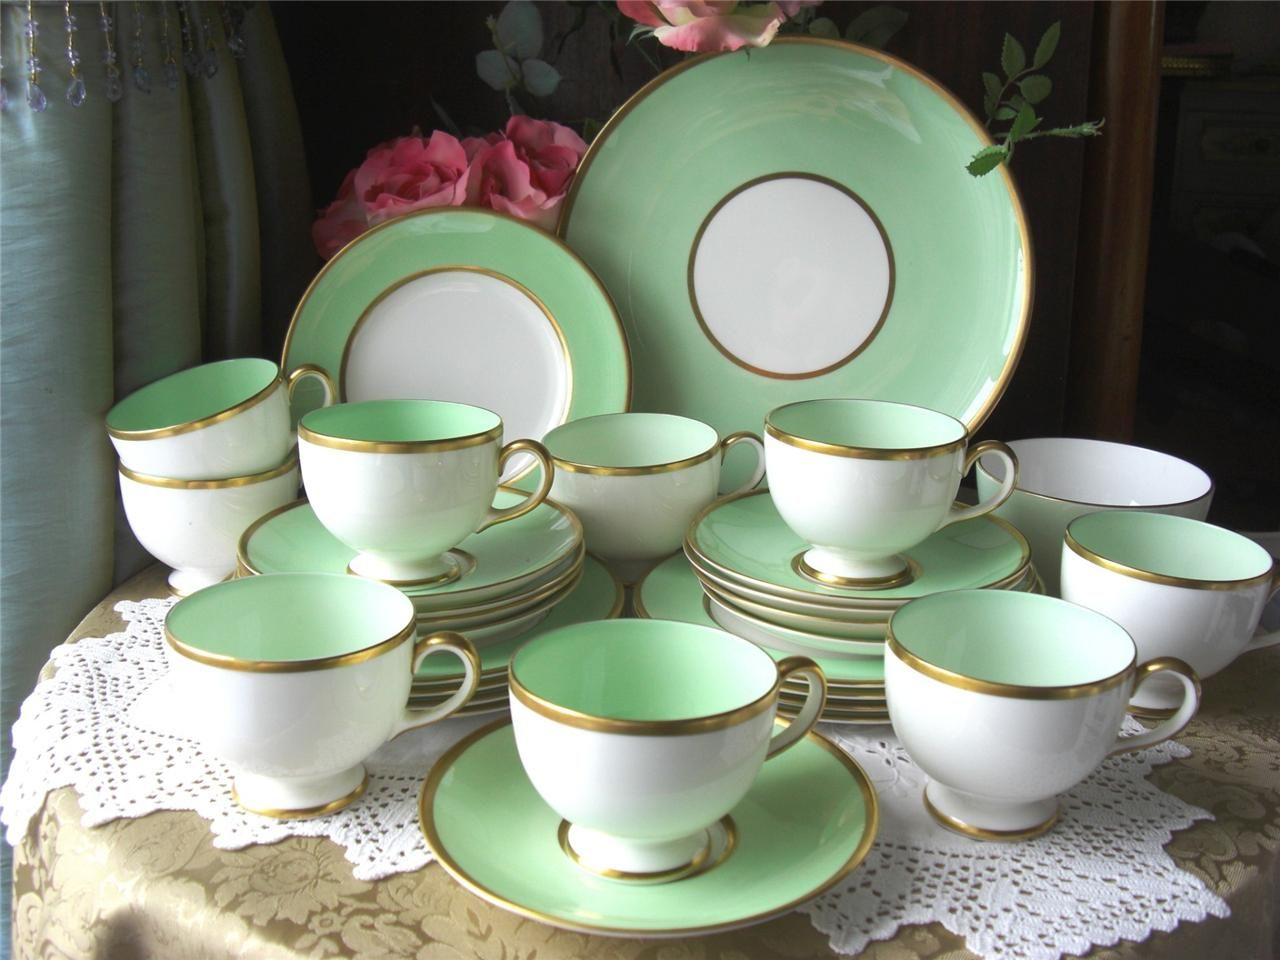 Wedgwood Art Deco China Tea Set Green